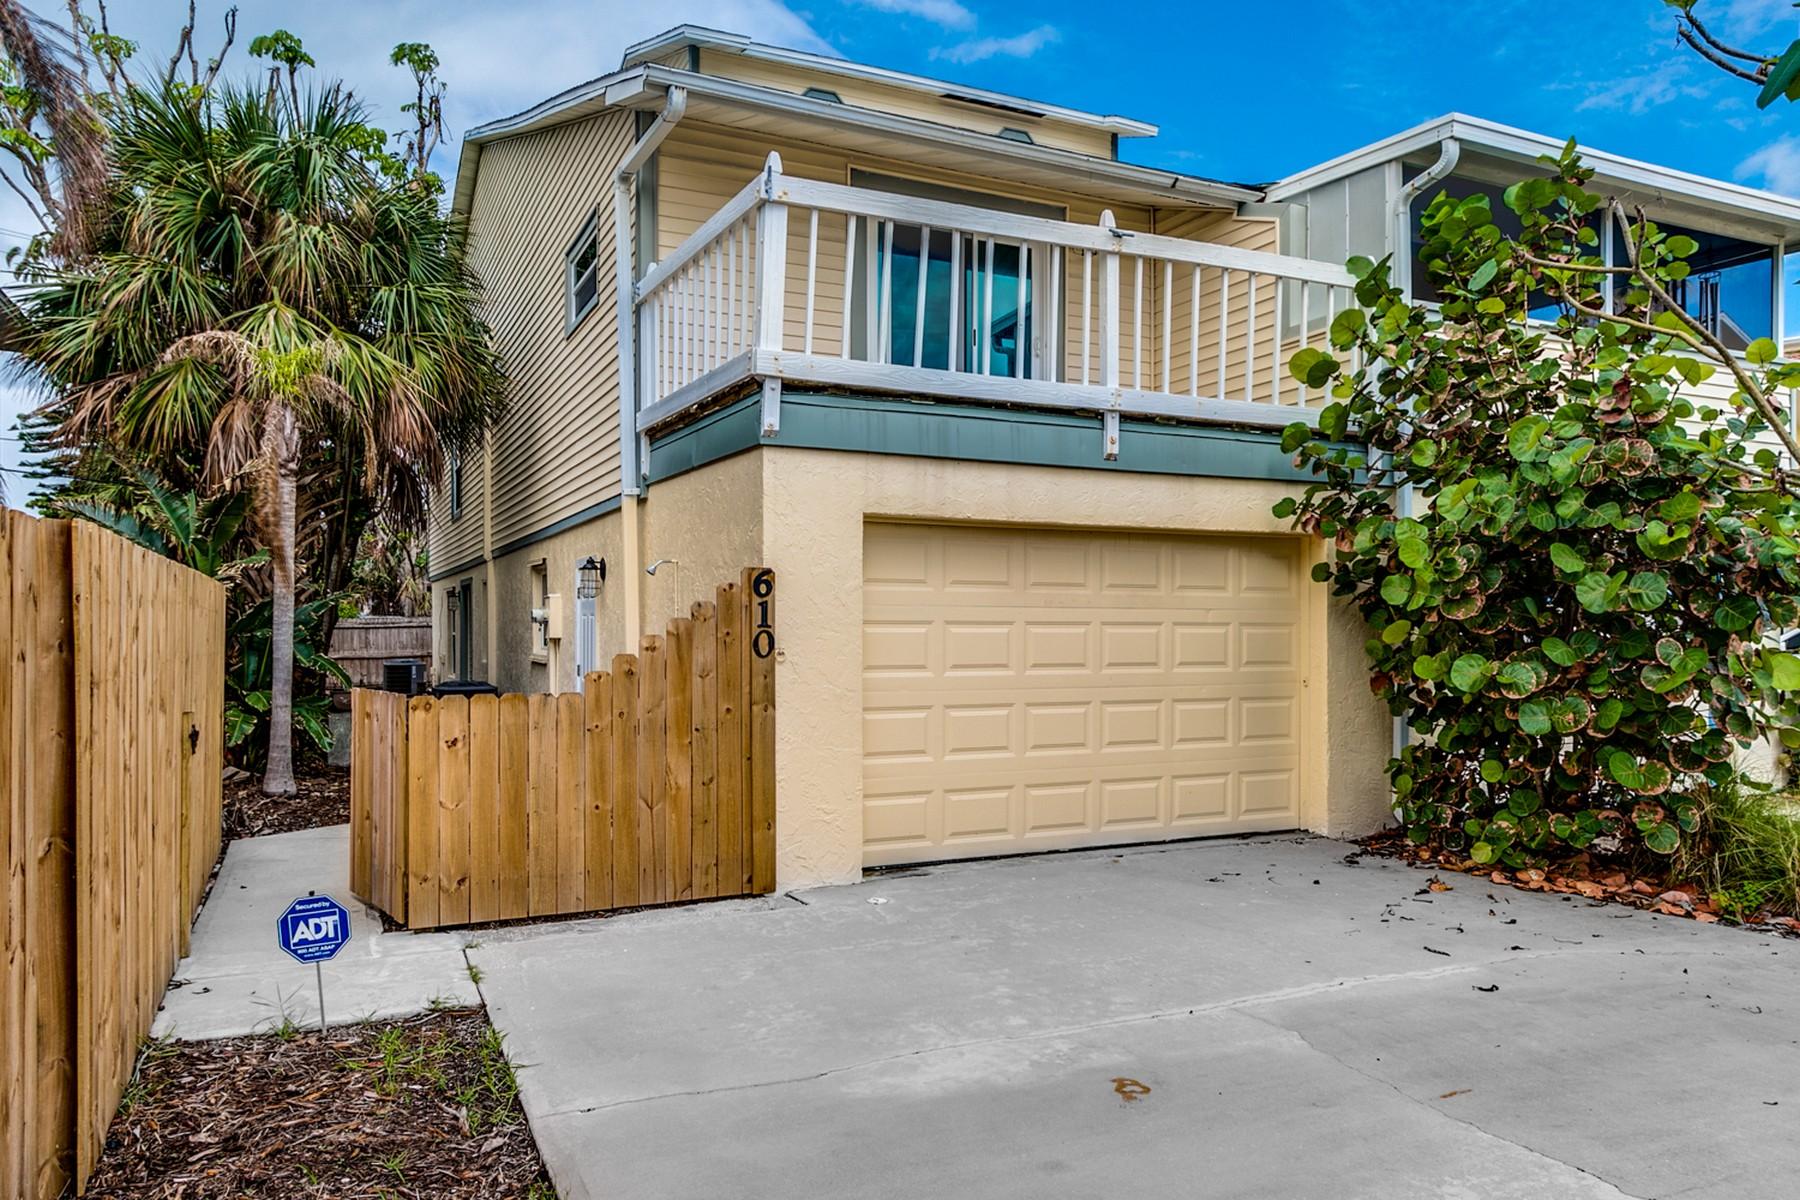 Oceans Gate Townhome 610 Monroe Avenue NE Cape Canaveral, Florida 32920 United States